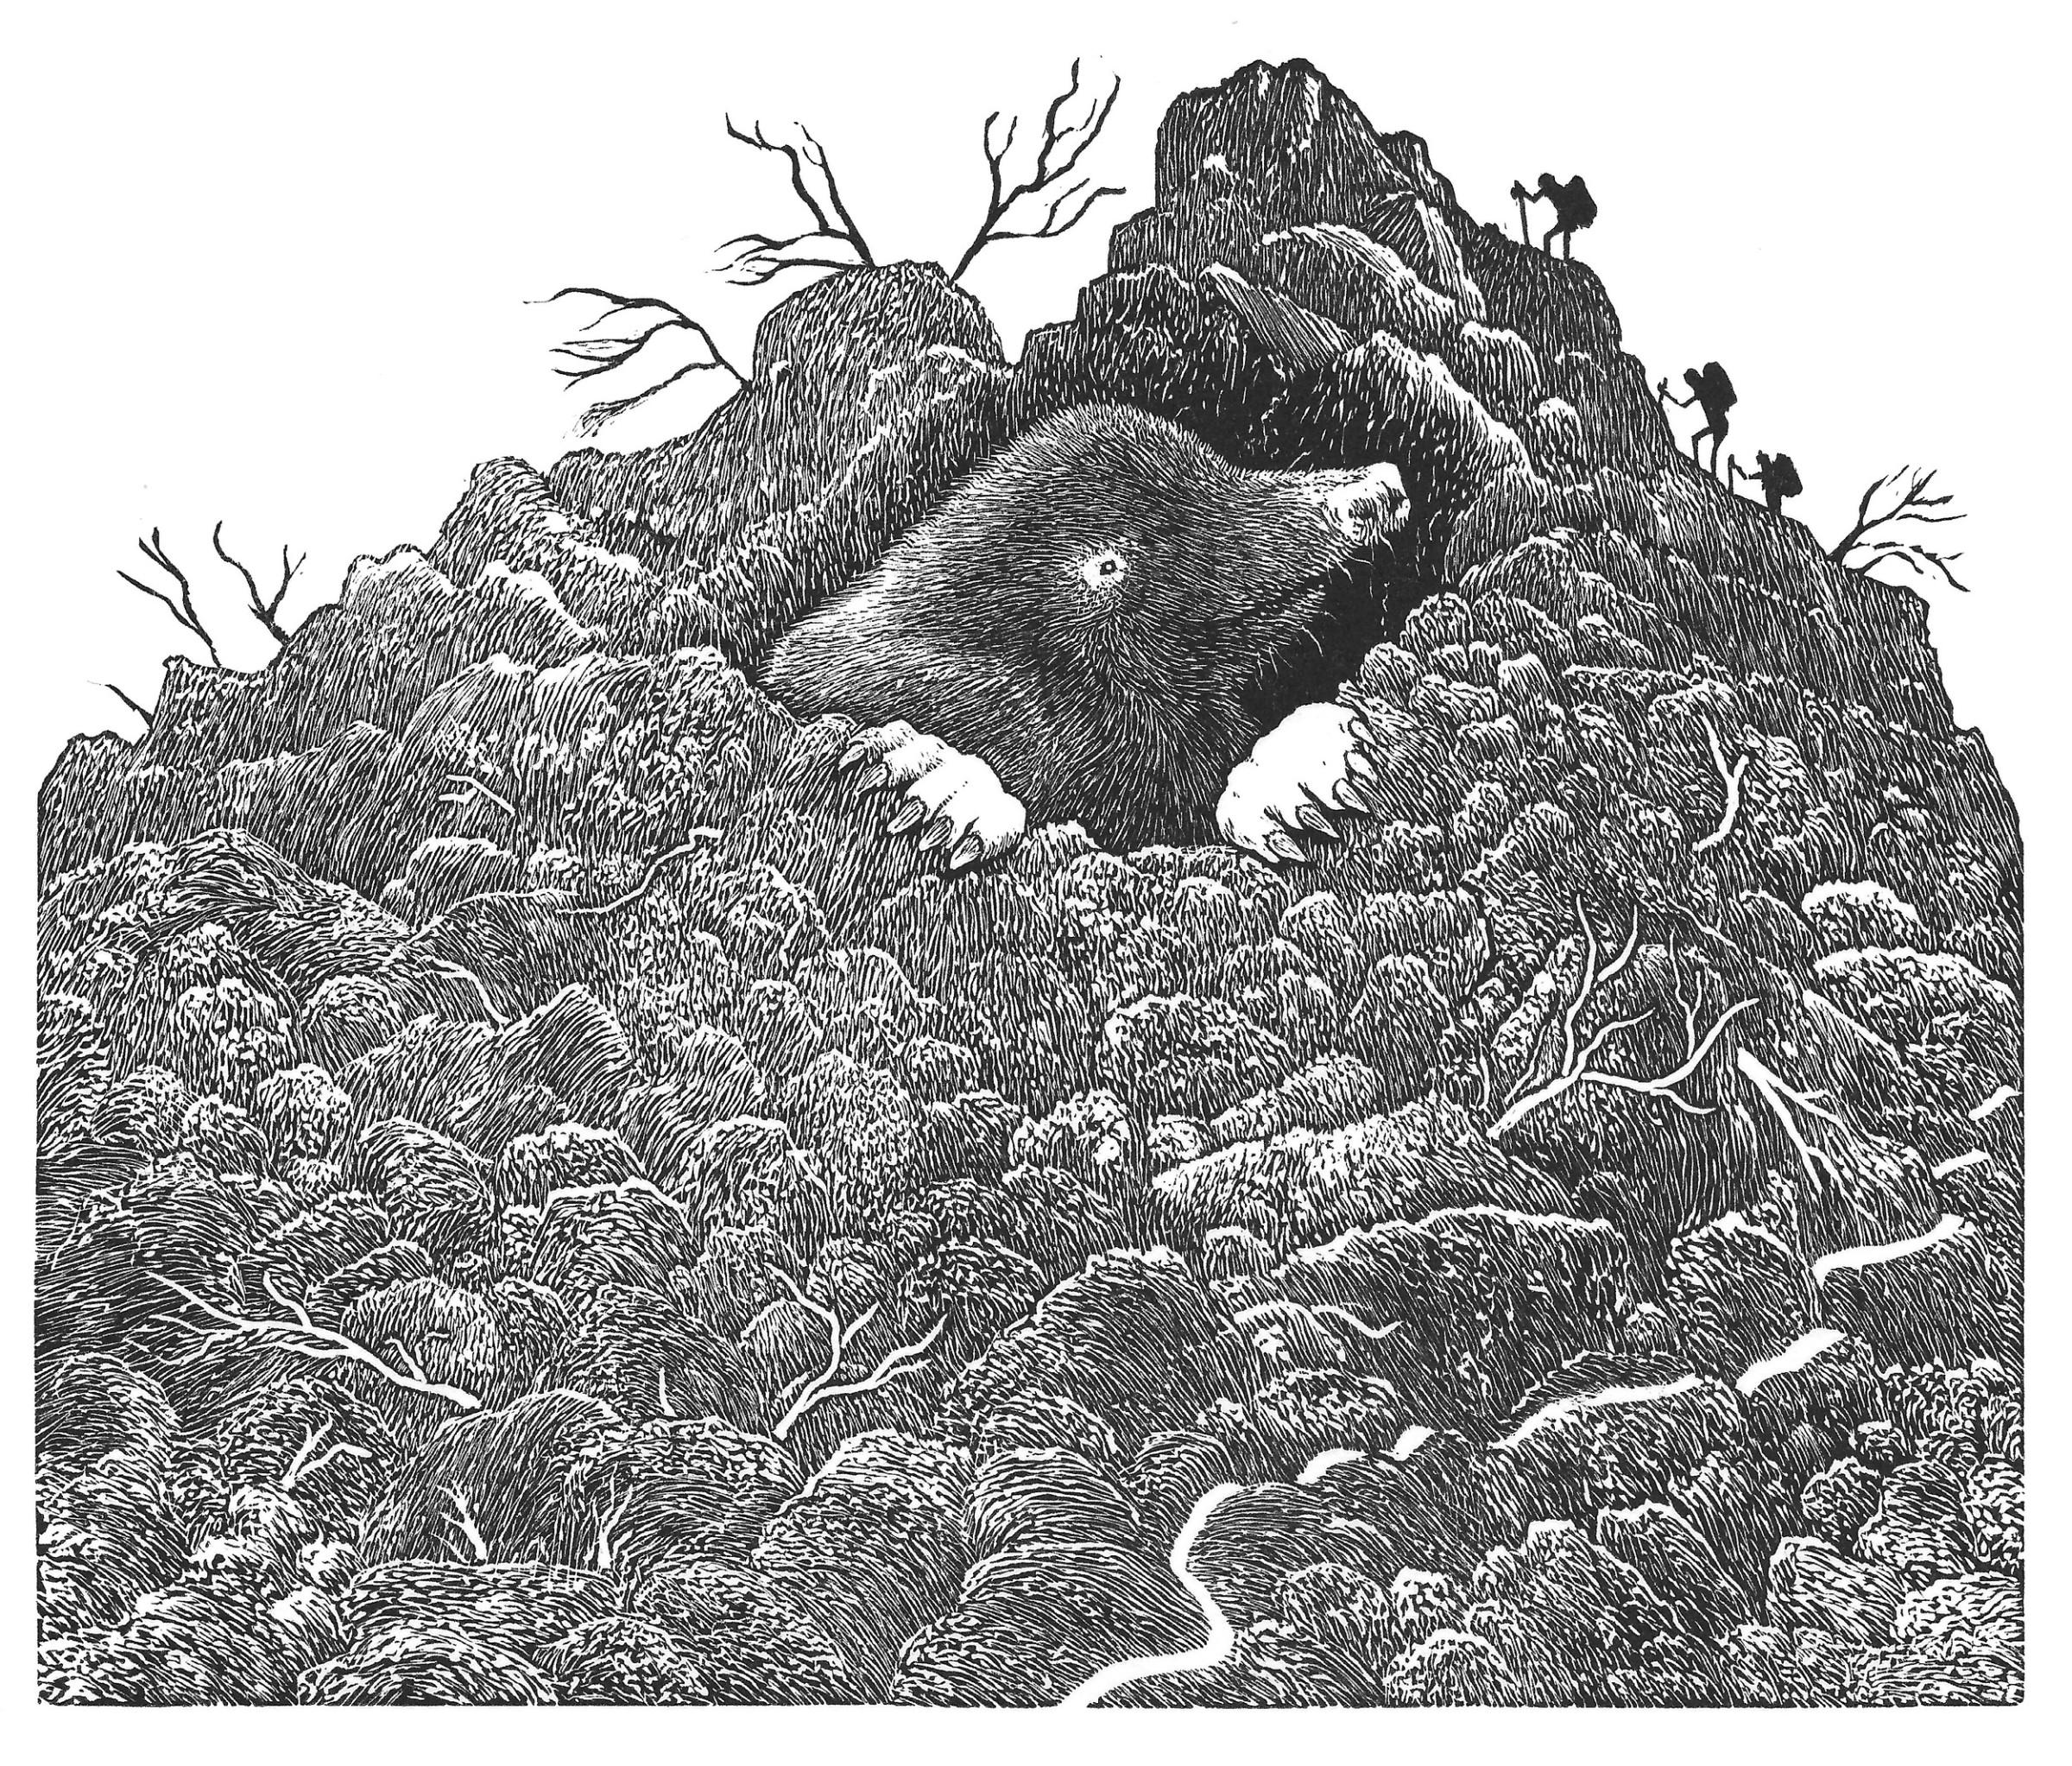 "<span class=""link fancybox-details-link""><a href=""/exhibitions/23/works/artworks_standalone11333/"">View Detail Page</a></span><div class=""artist""><span class=""artist""><strong>Jim Westergard RE</strong></span></div><div class=""title""><em>Making a Mountain Of a Molehill</em></div><div class=""medium"">wood engraving</div><div class=""dimensions"">17.5 x 20.5 cm paper size<br>12.5 x 15 cm image size</div><div class=""edition_details"">edition of 60</div>"